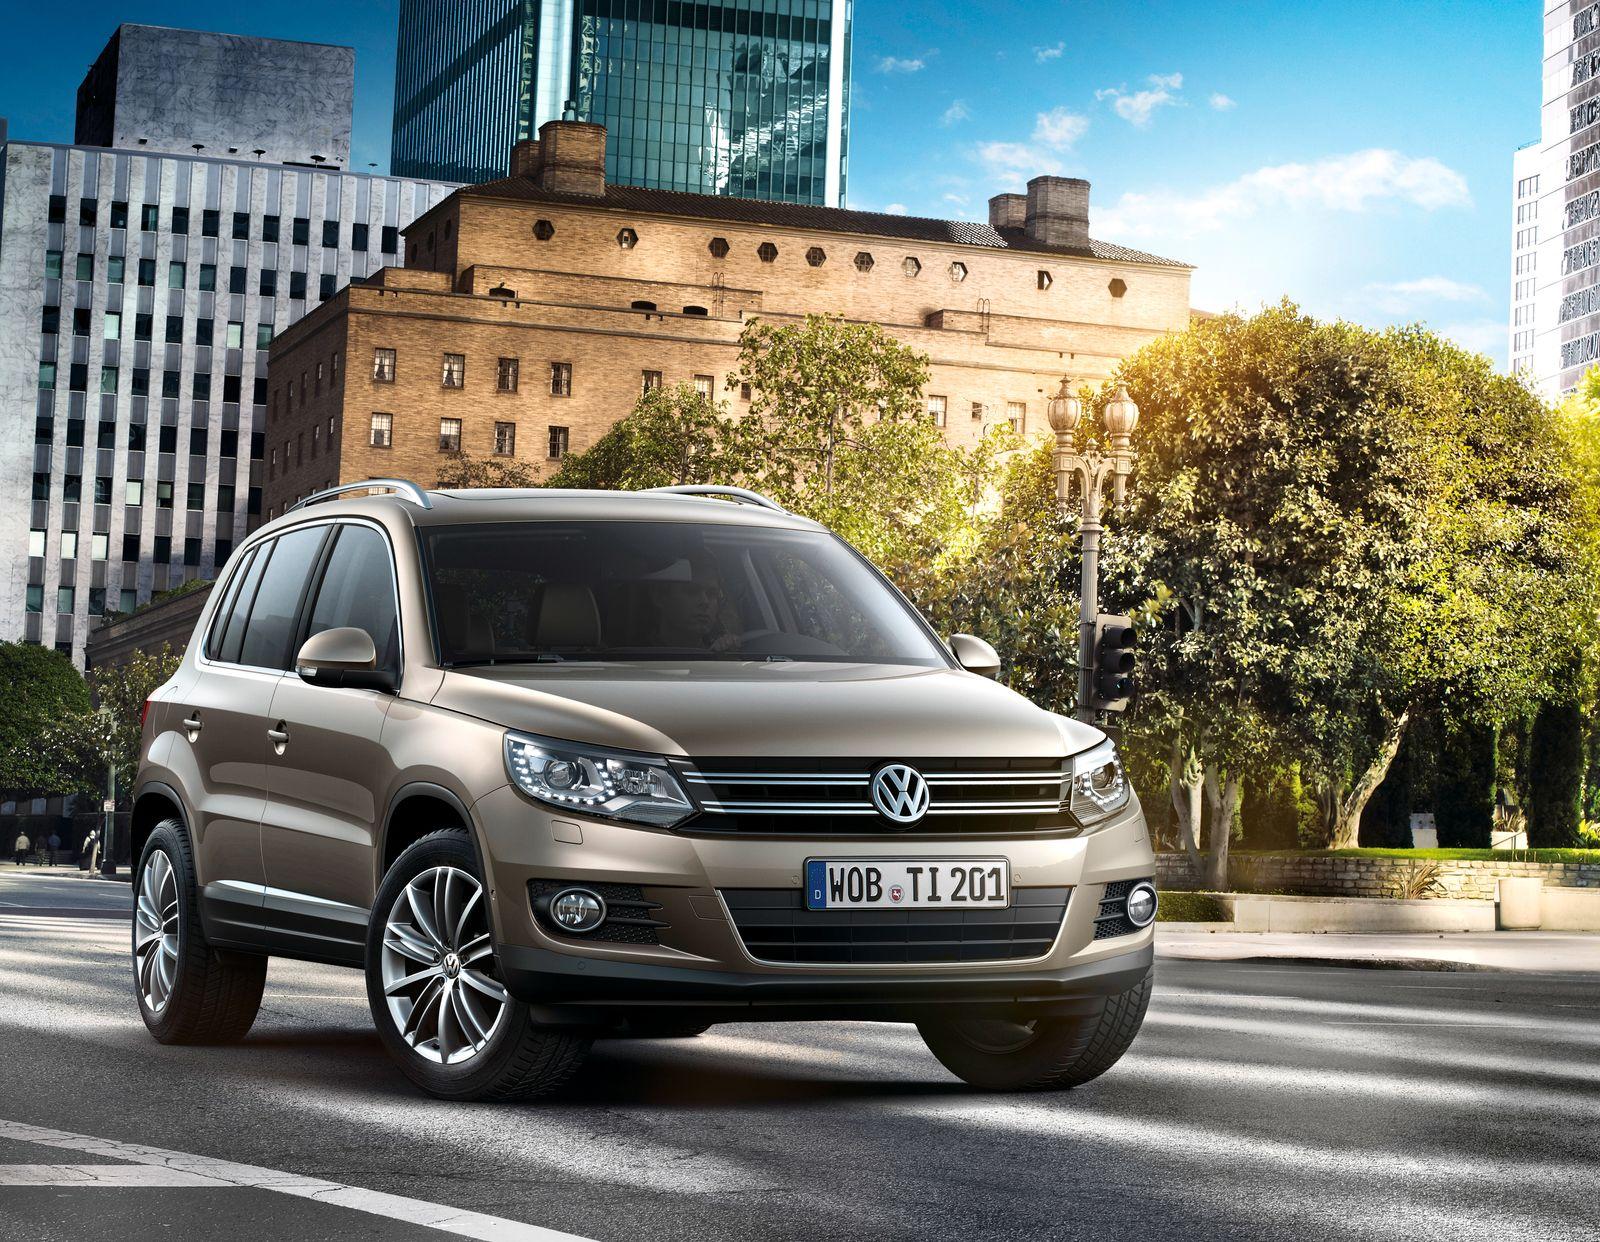 VW Tiguan / Genf-Karussell